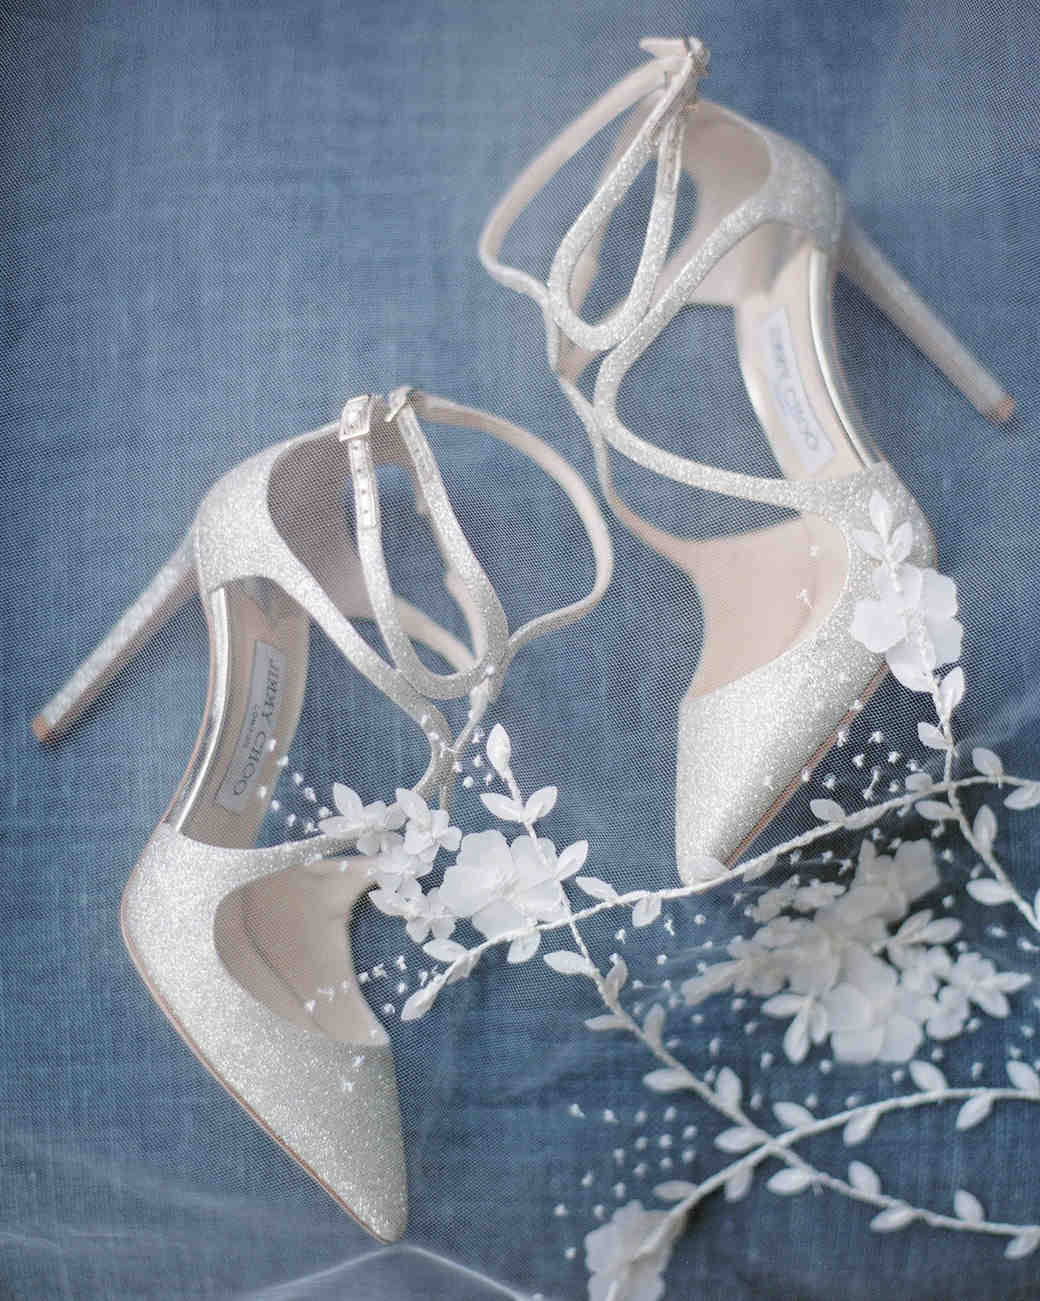 sloan scott wedding white shoes on blue background